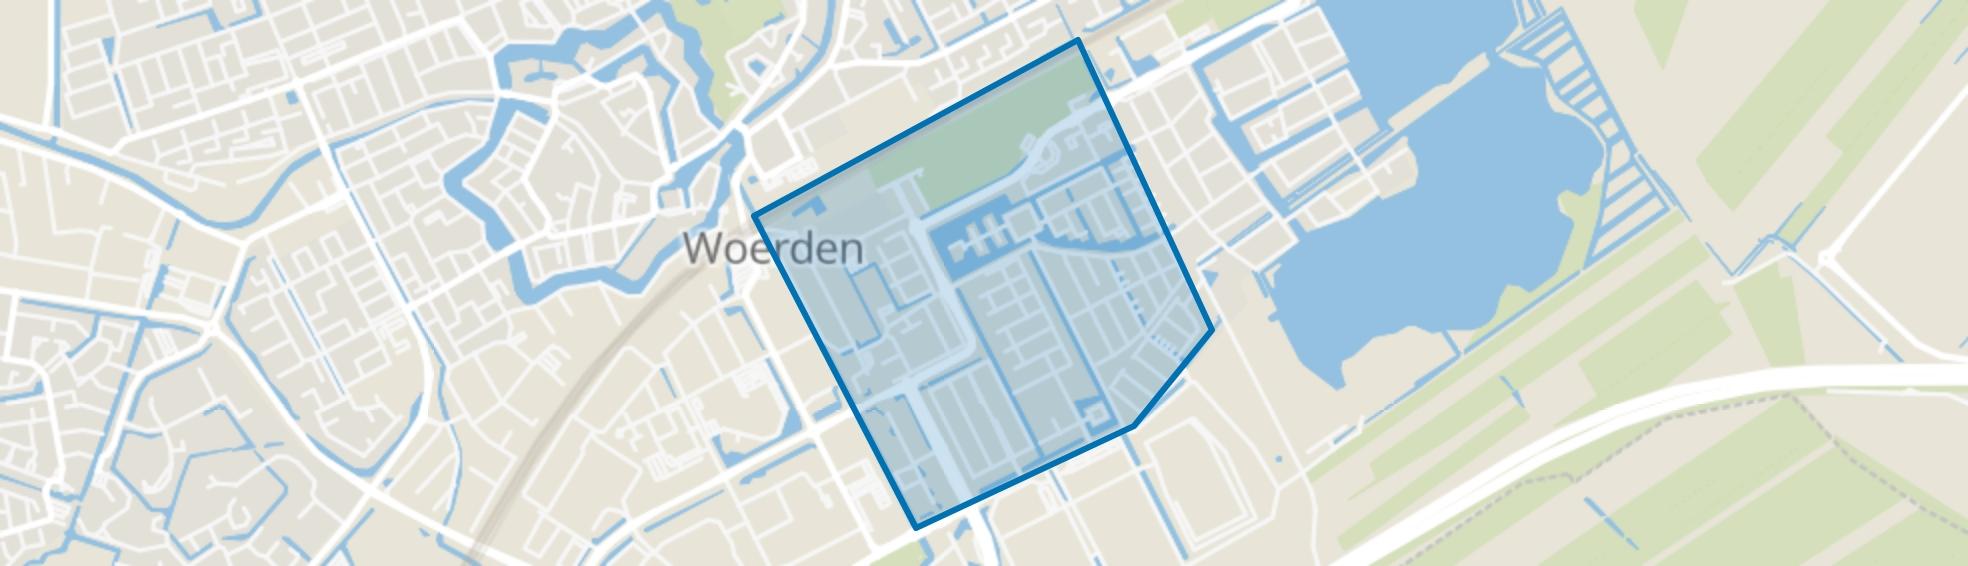 Snel en Polanen, Woerden map